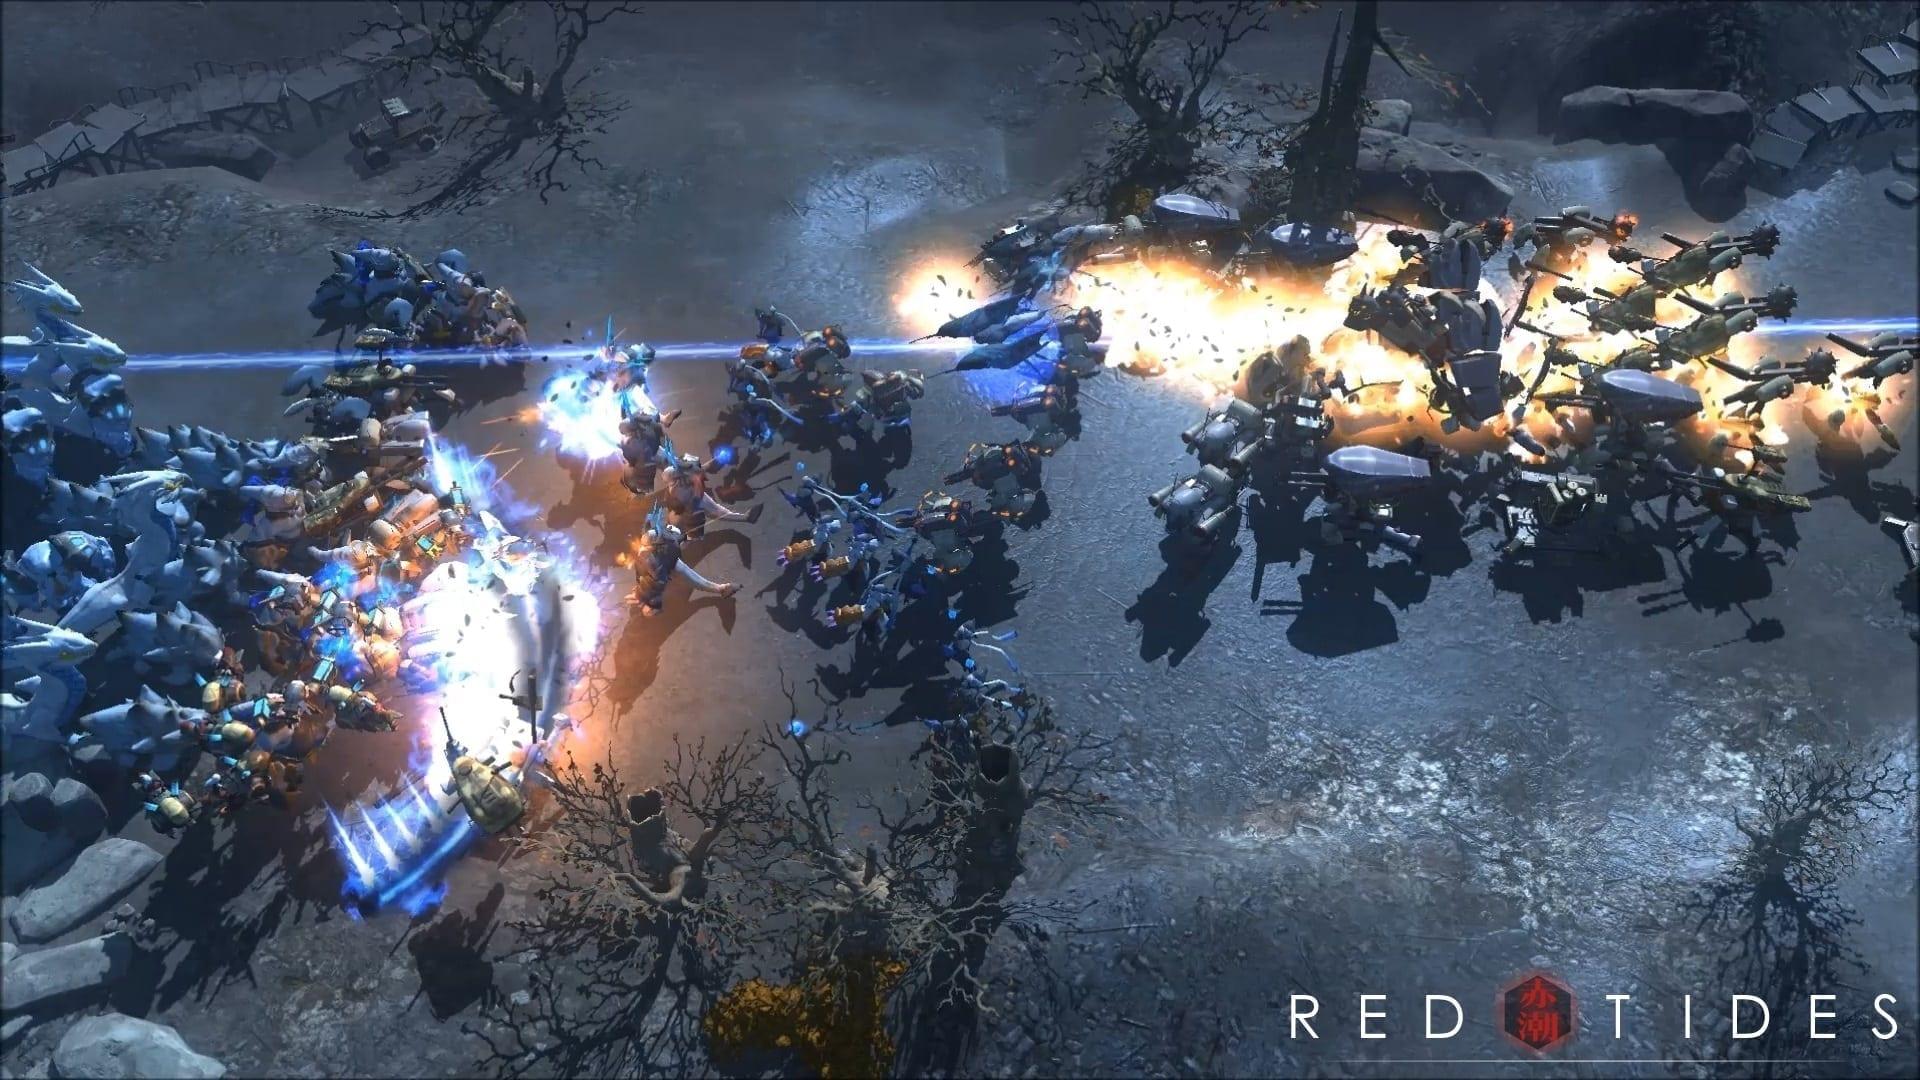 red-tides-screenshot-1